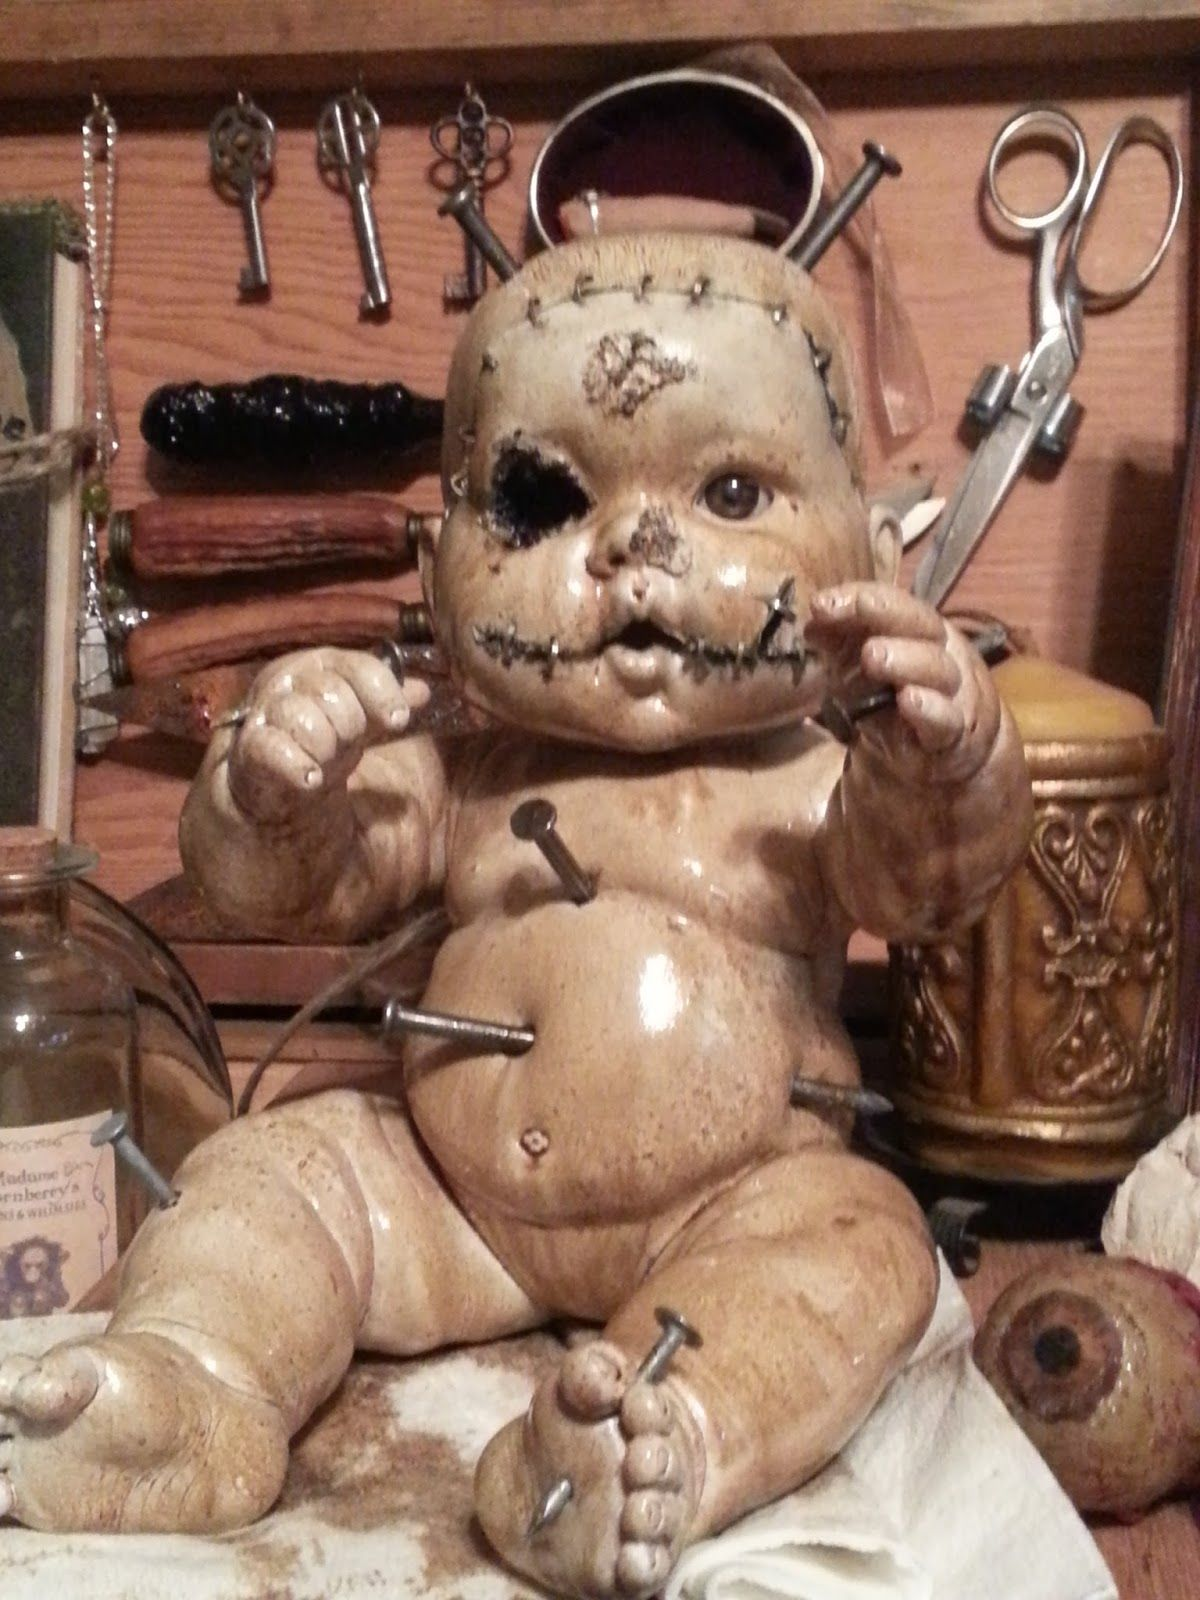 Thea's Krafty Kitchen Halloween. Creepy baby doll make